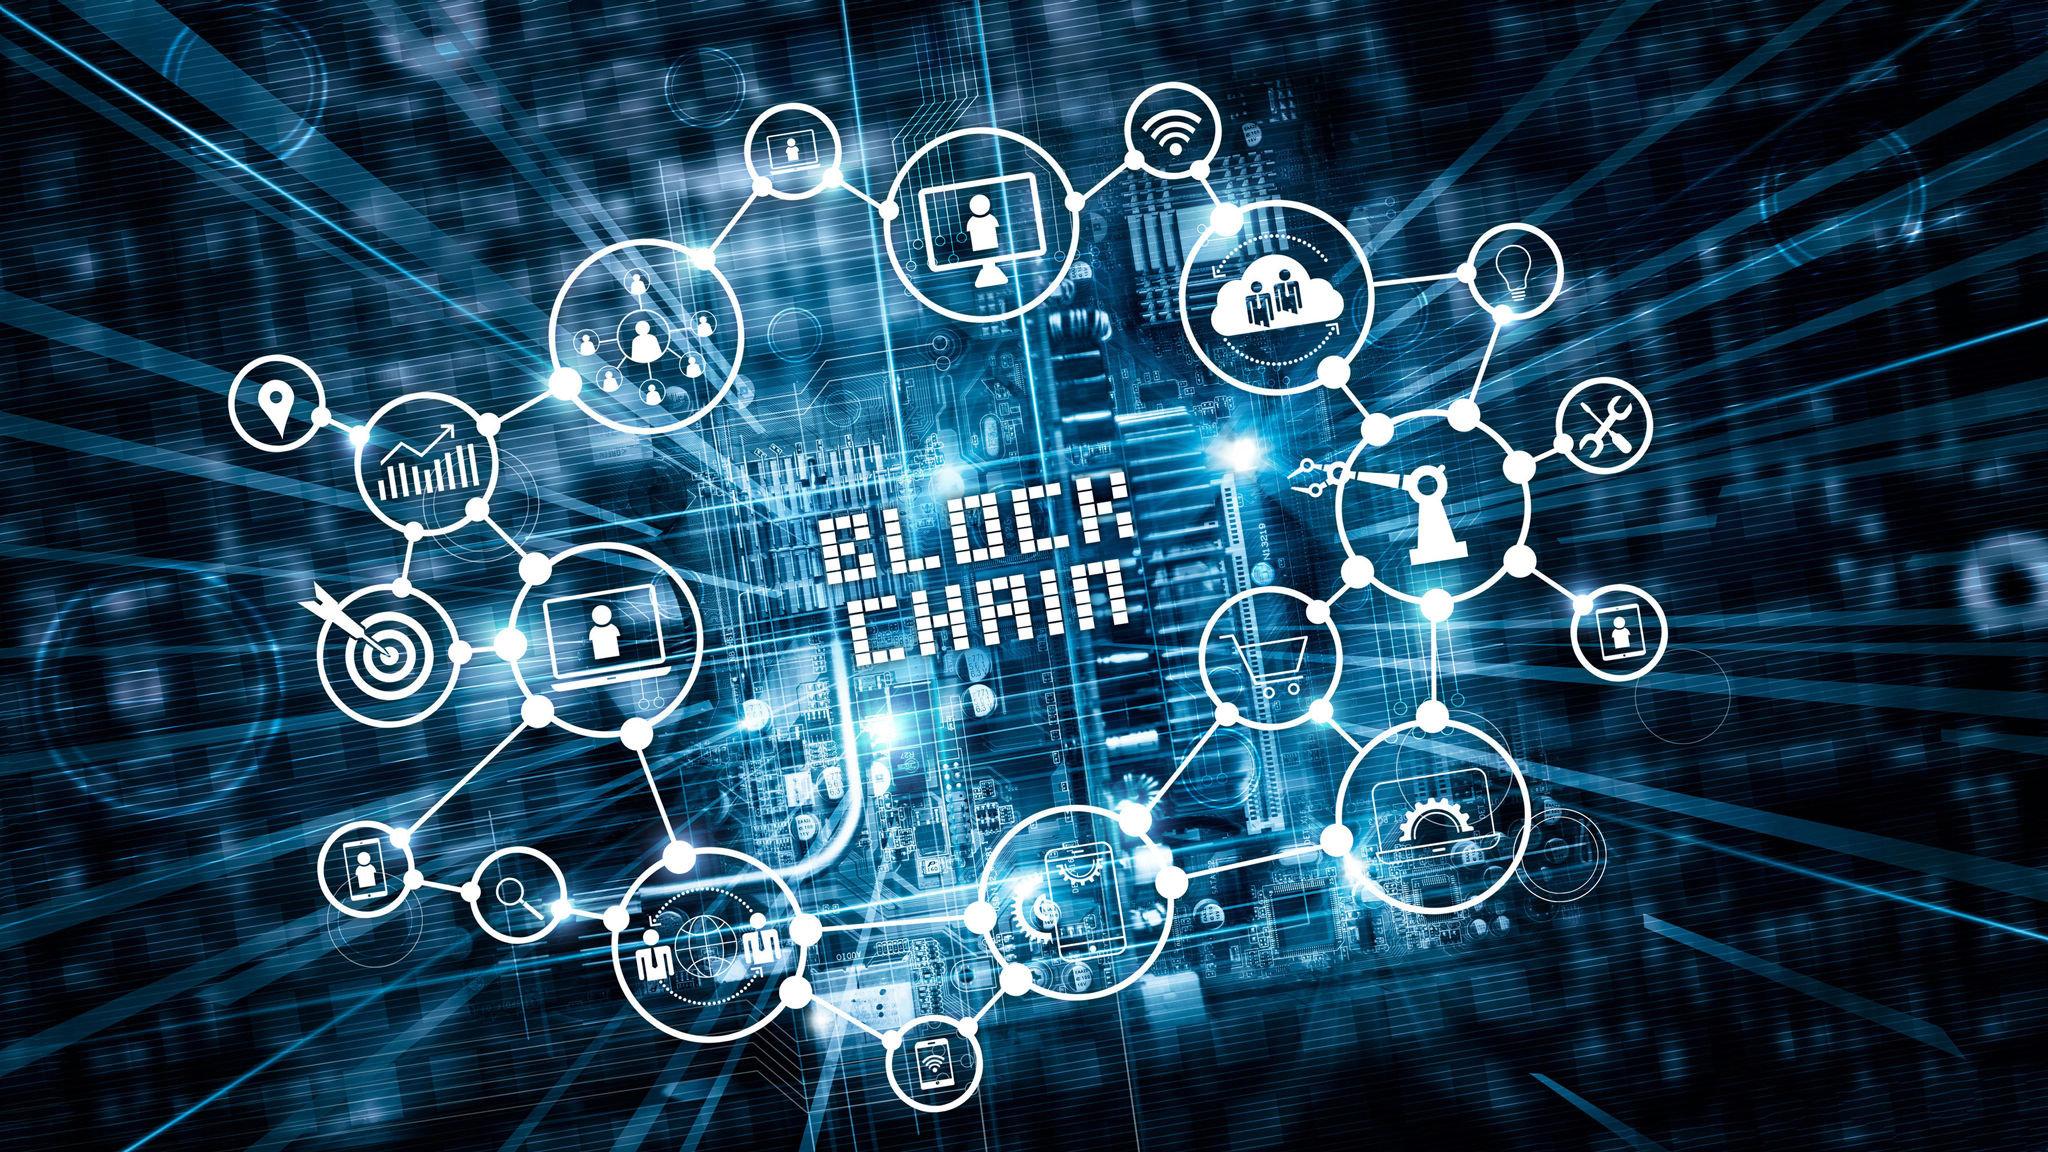 Deutsche Bank joins JPMorgan-led blockchain network